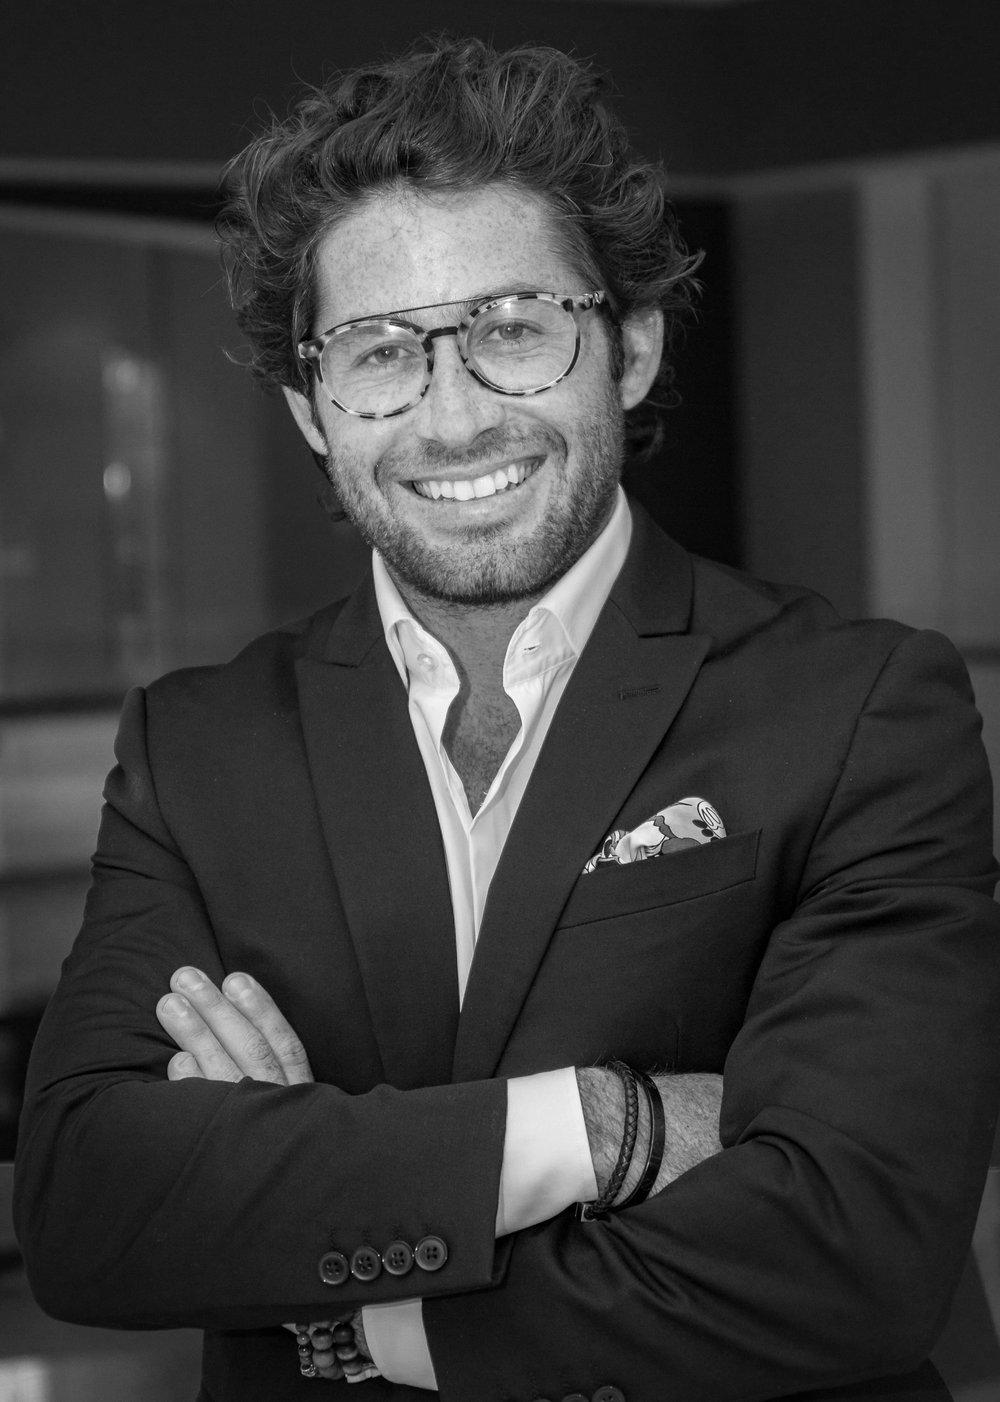 Alexander Goldstein of Miles Goldstein Real Estate